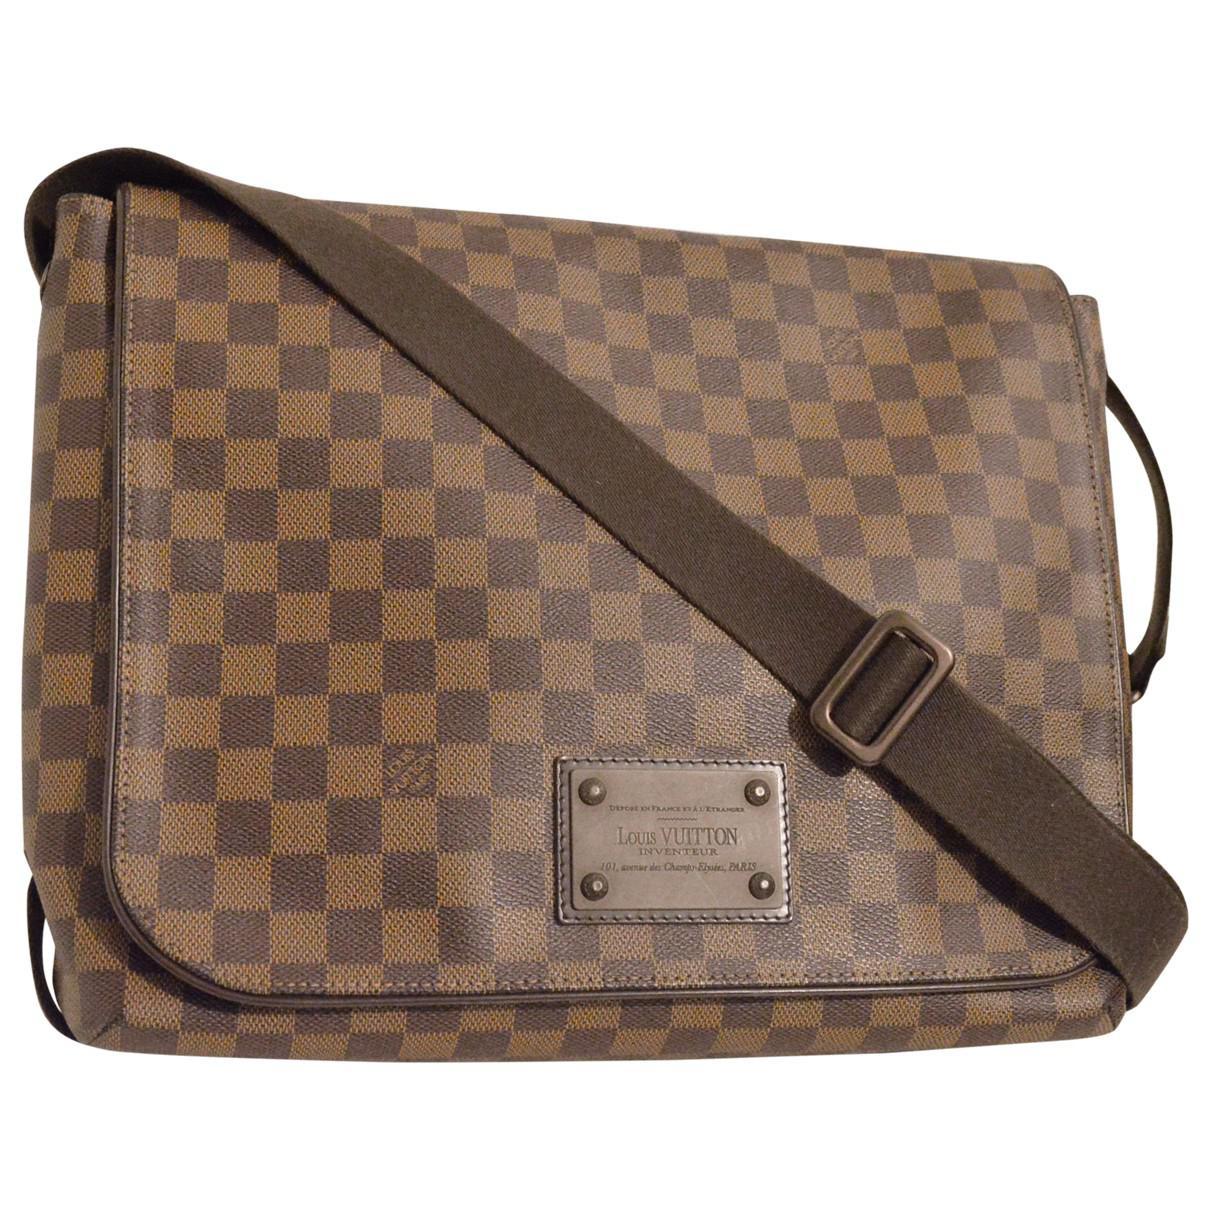 Louis Vuitton Pre-owned - Cloth bag CZkAR5jh